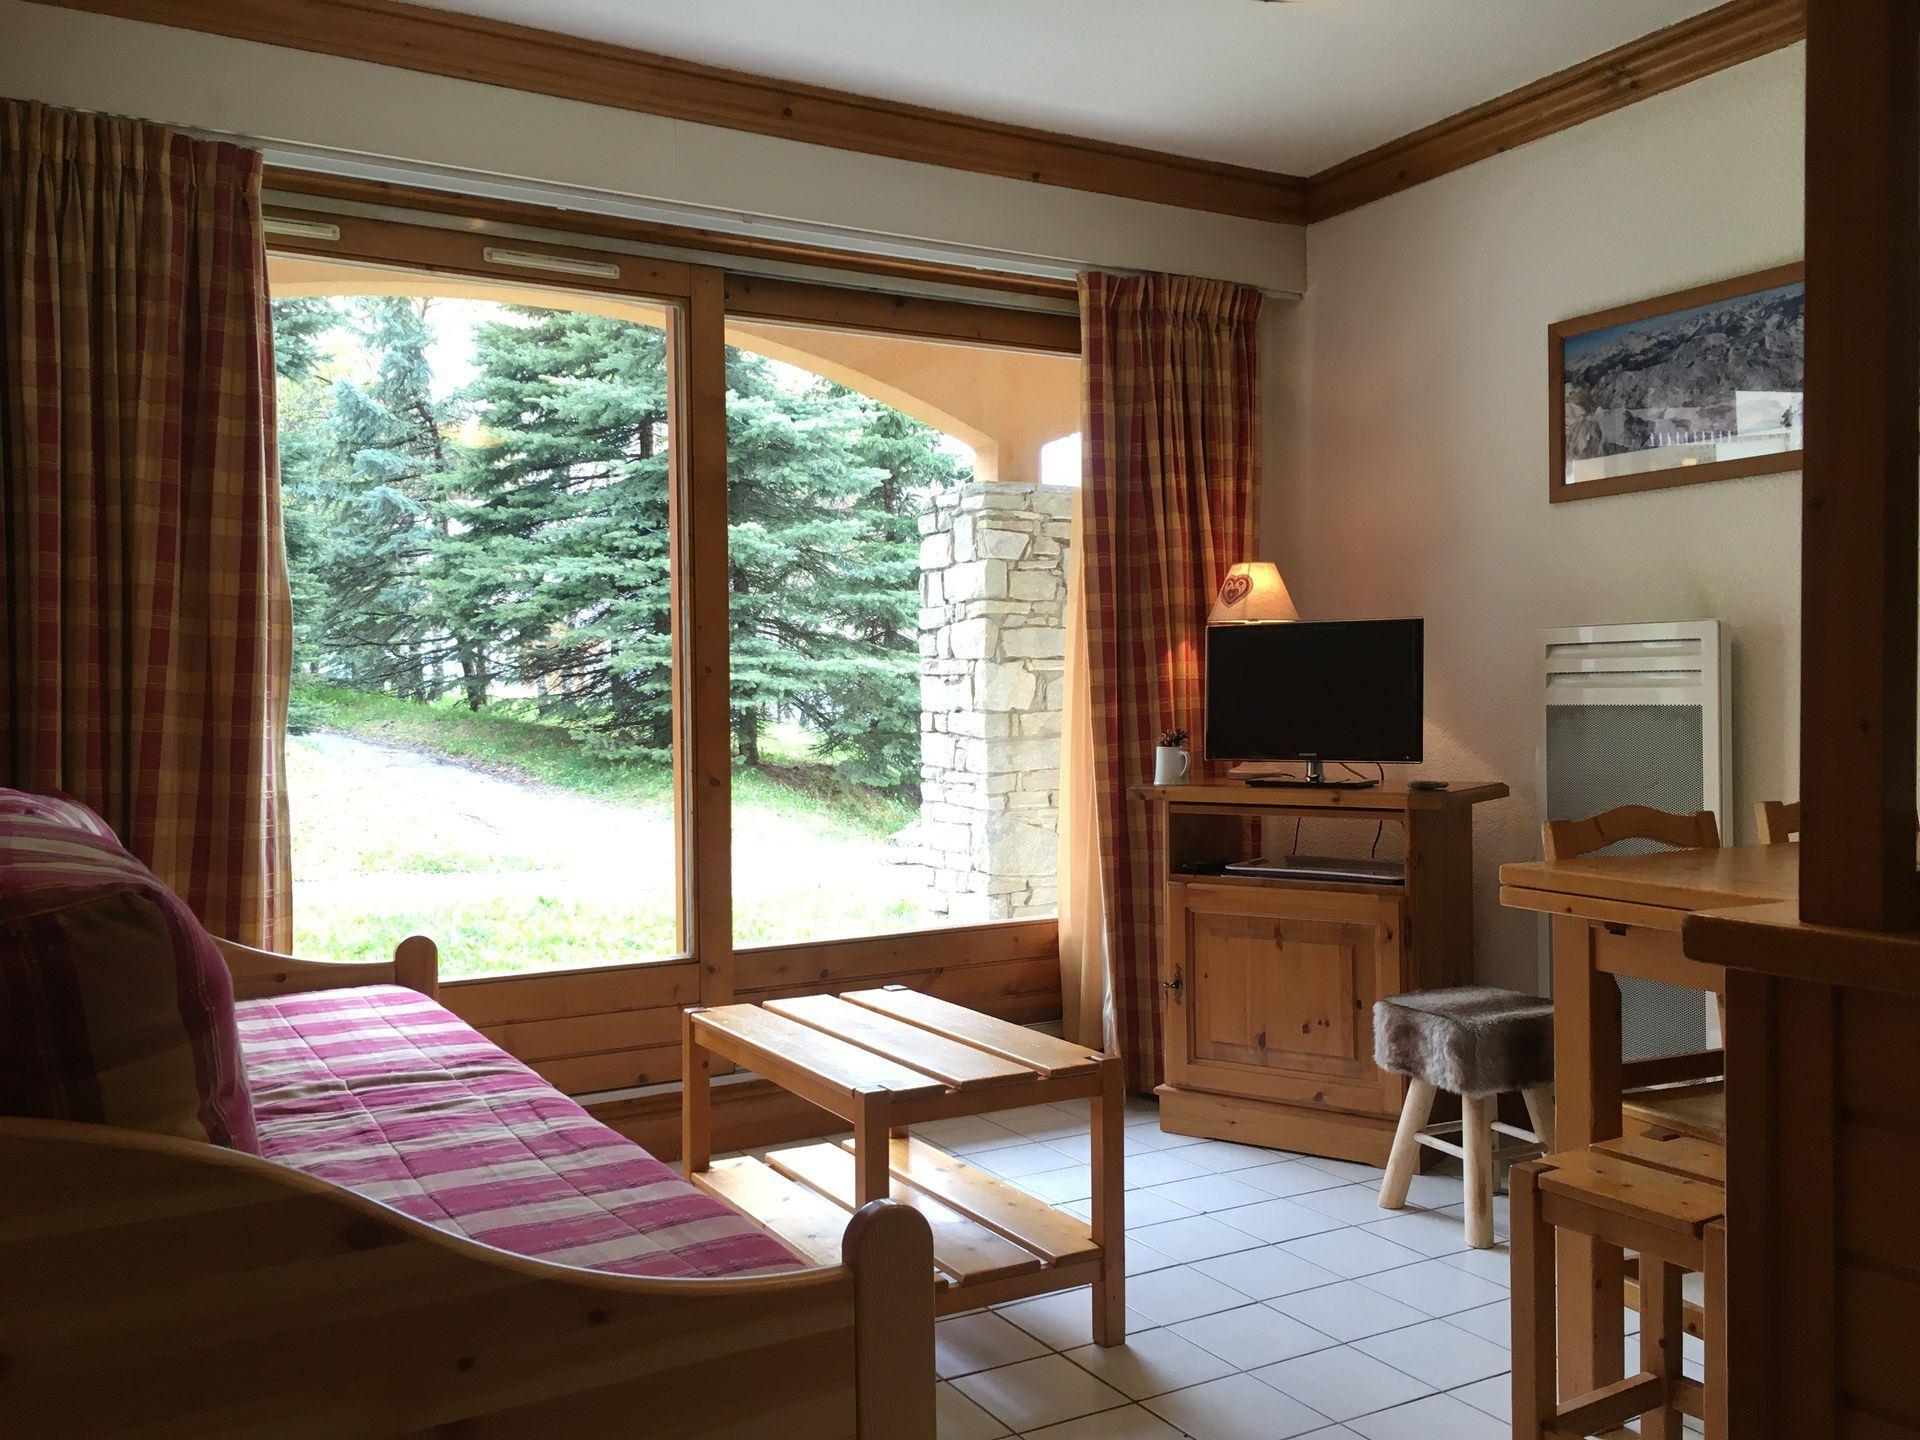 2 Rooms cabin 6 Pers ski-in ski-out / BALCONS DE TOUGNETTE 2